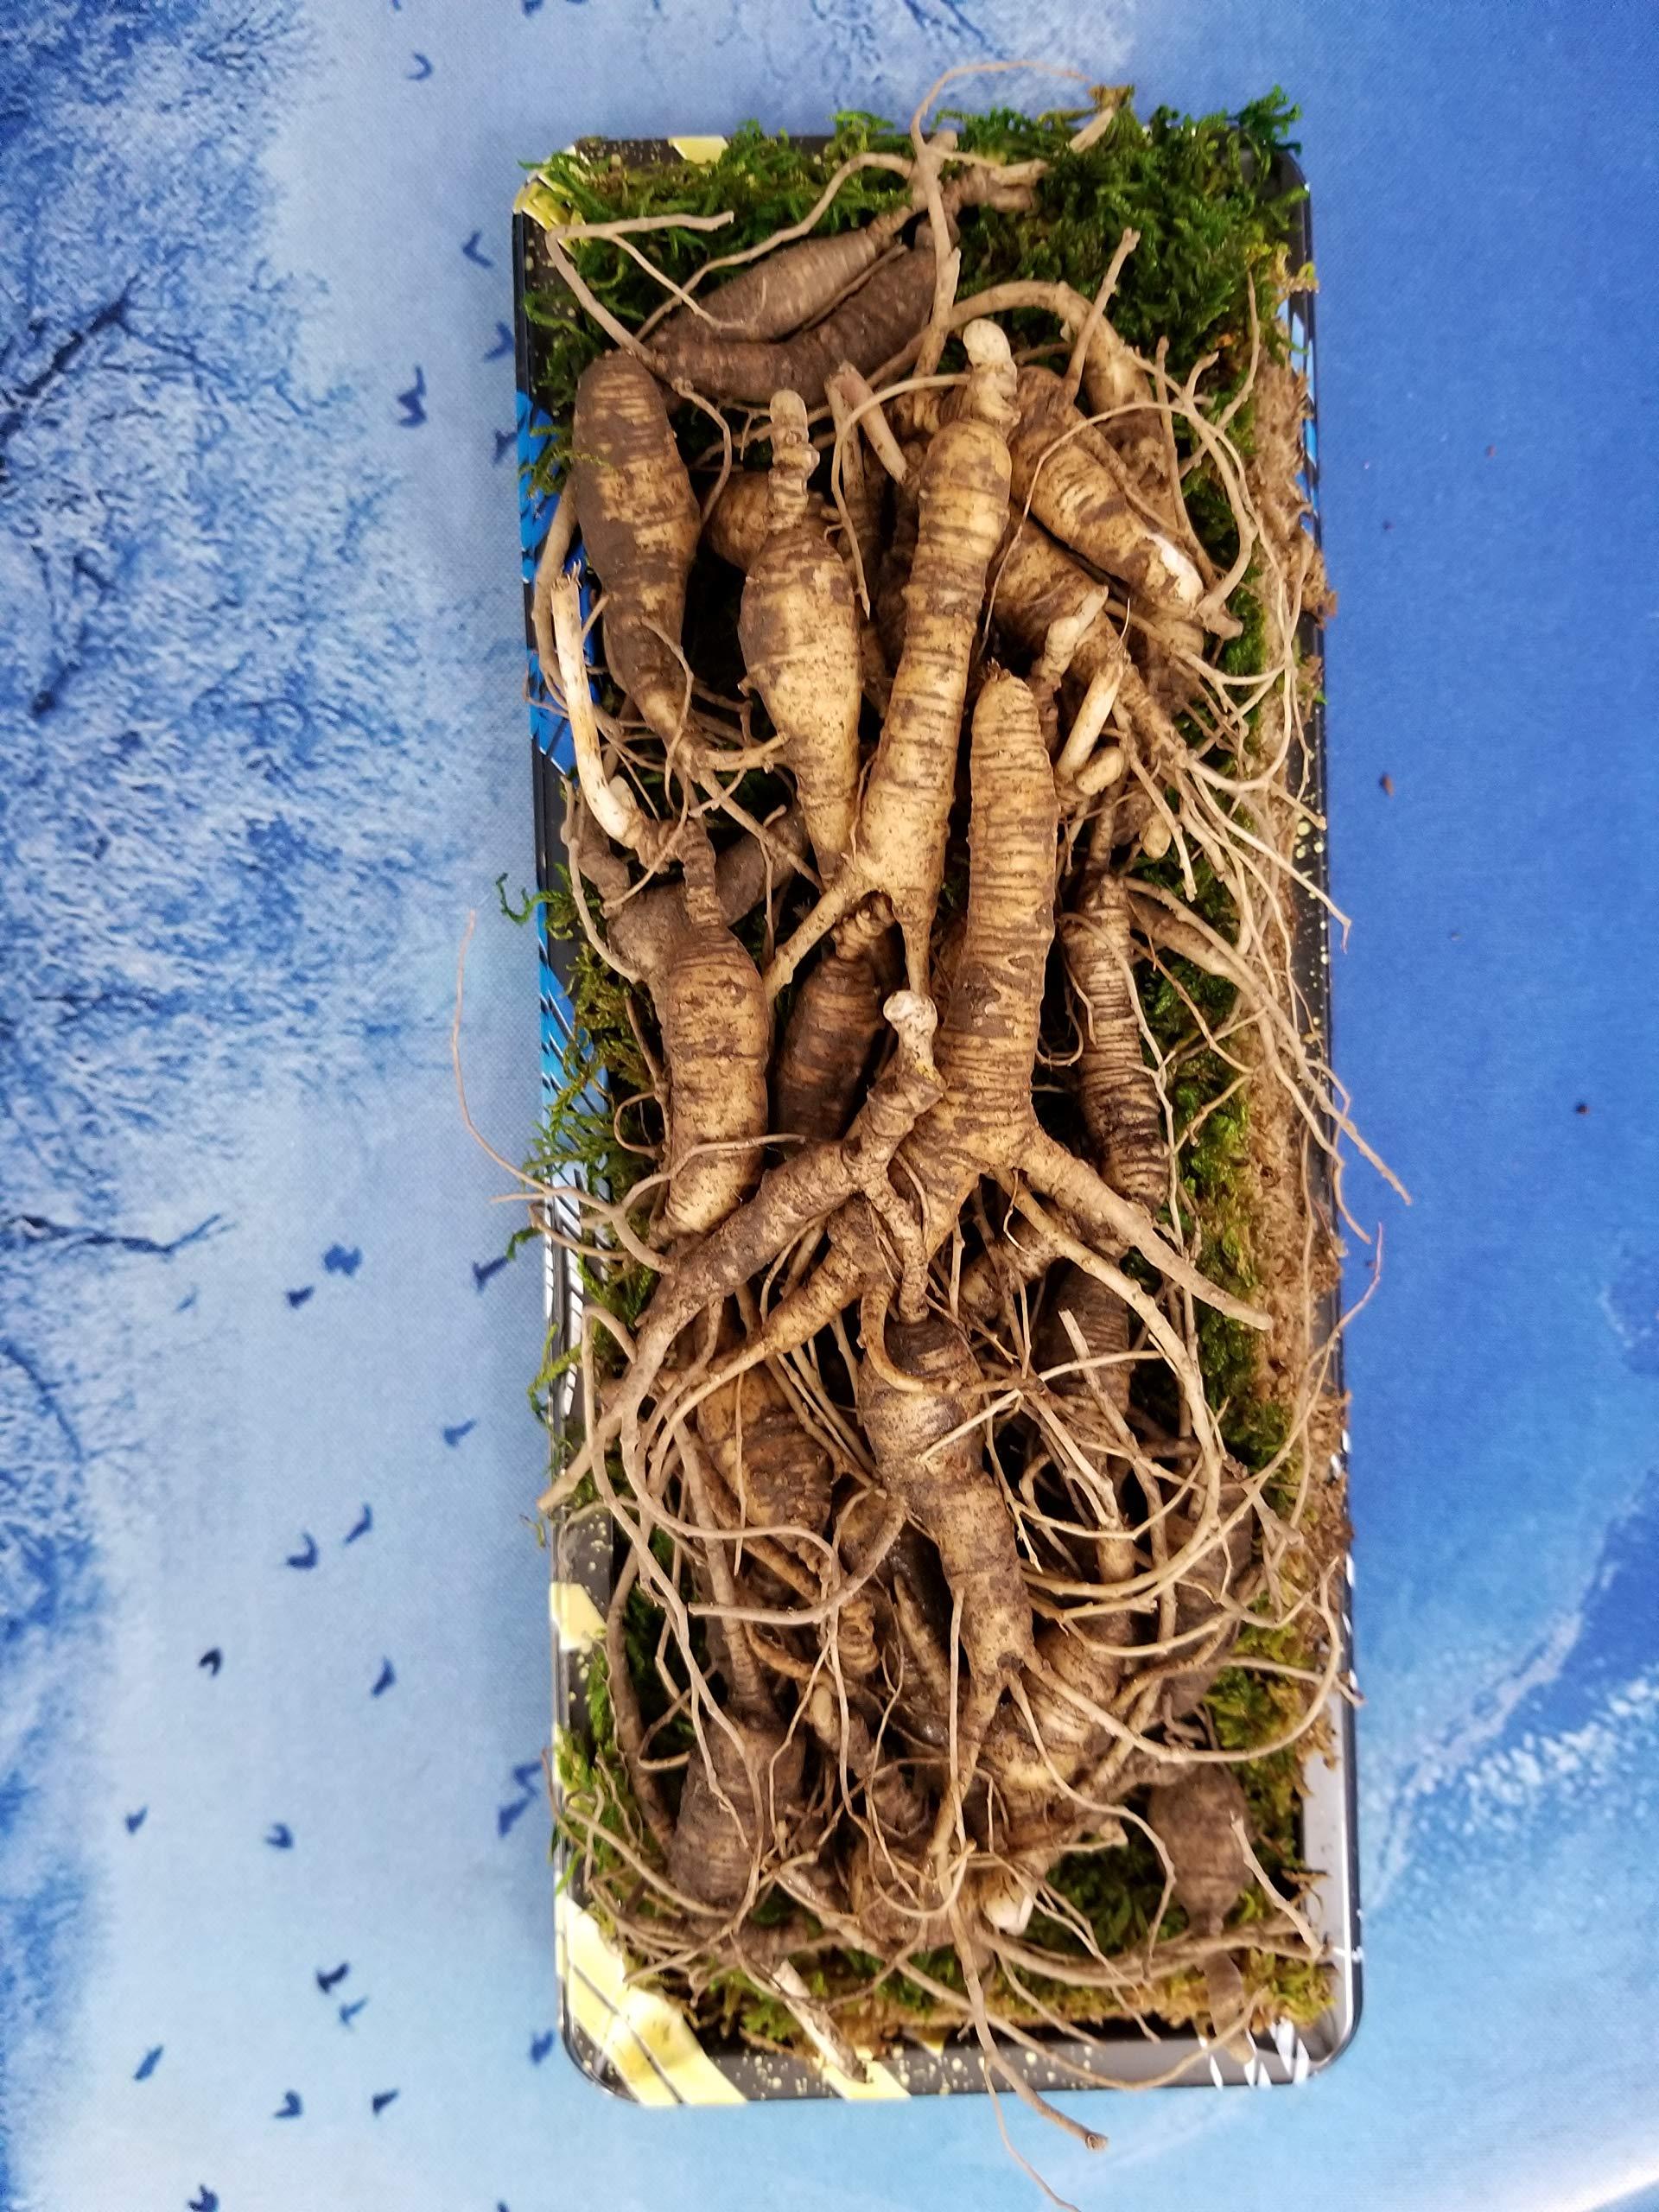 American Wild Fresh Ginseng Appalachian Mountain PANAX 100% Natural Organic Fresh Wild Ginseng Root 3 Oz Pack (10~15 Years Old, Approximately 35pcs) King of Saponin!